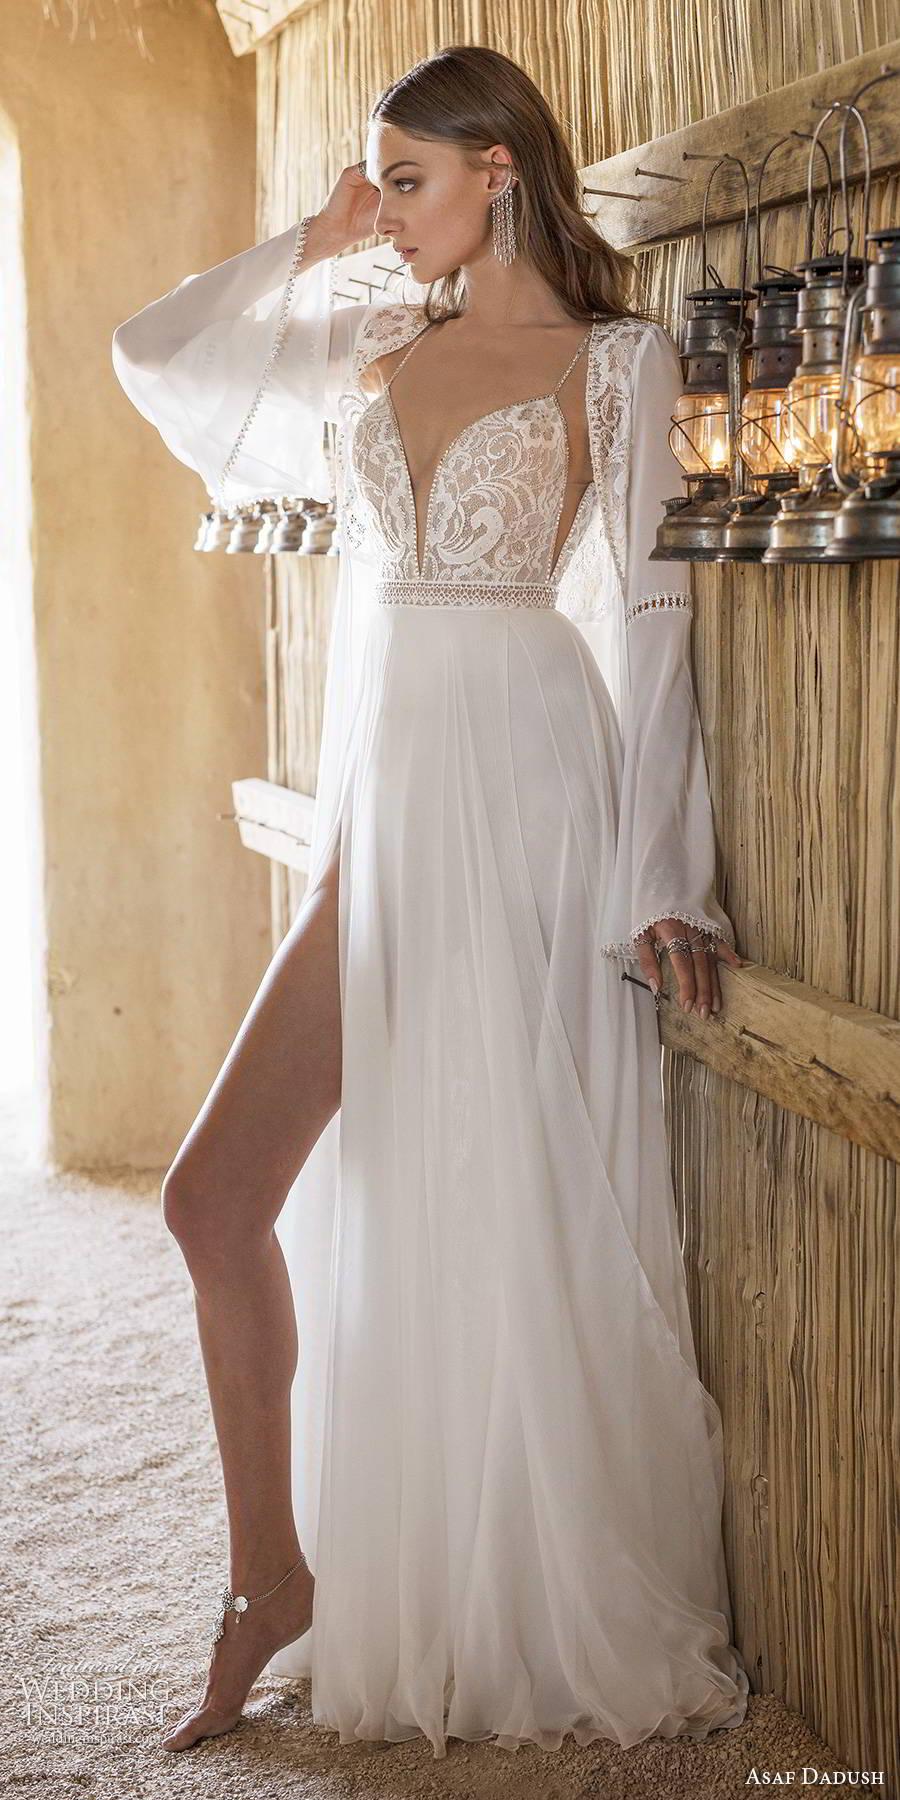 asaf dadush 2019 bridal sleeveless thin straps plunging v neckline embellished bodice slit skirt sexy a line wedding dress jacket (6) sv